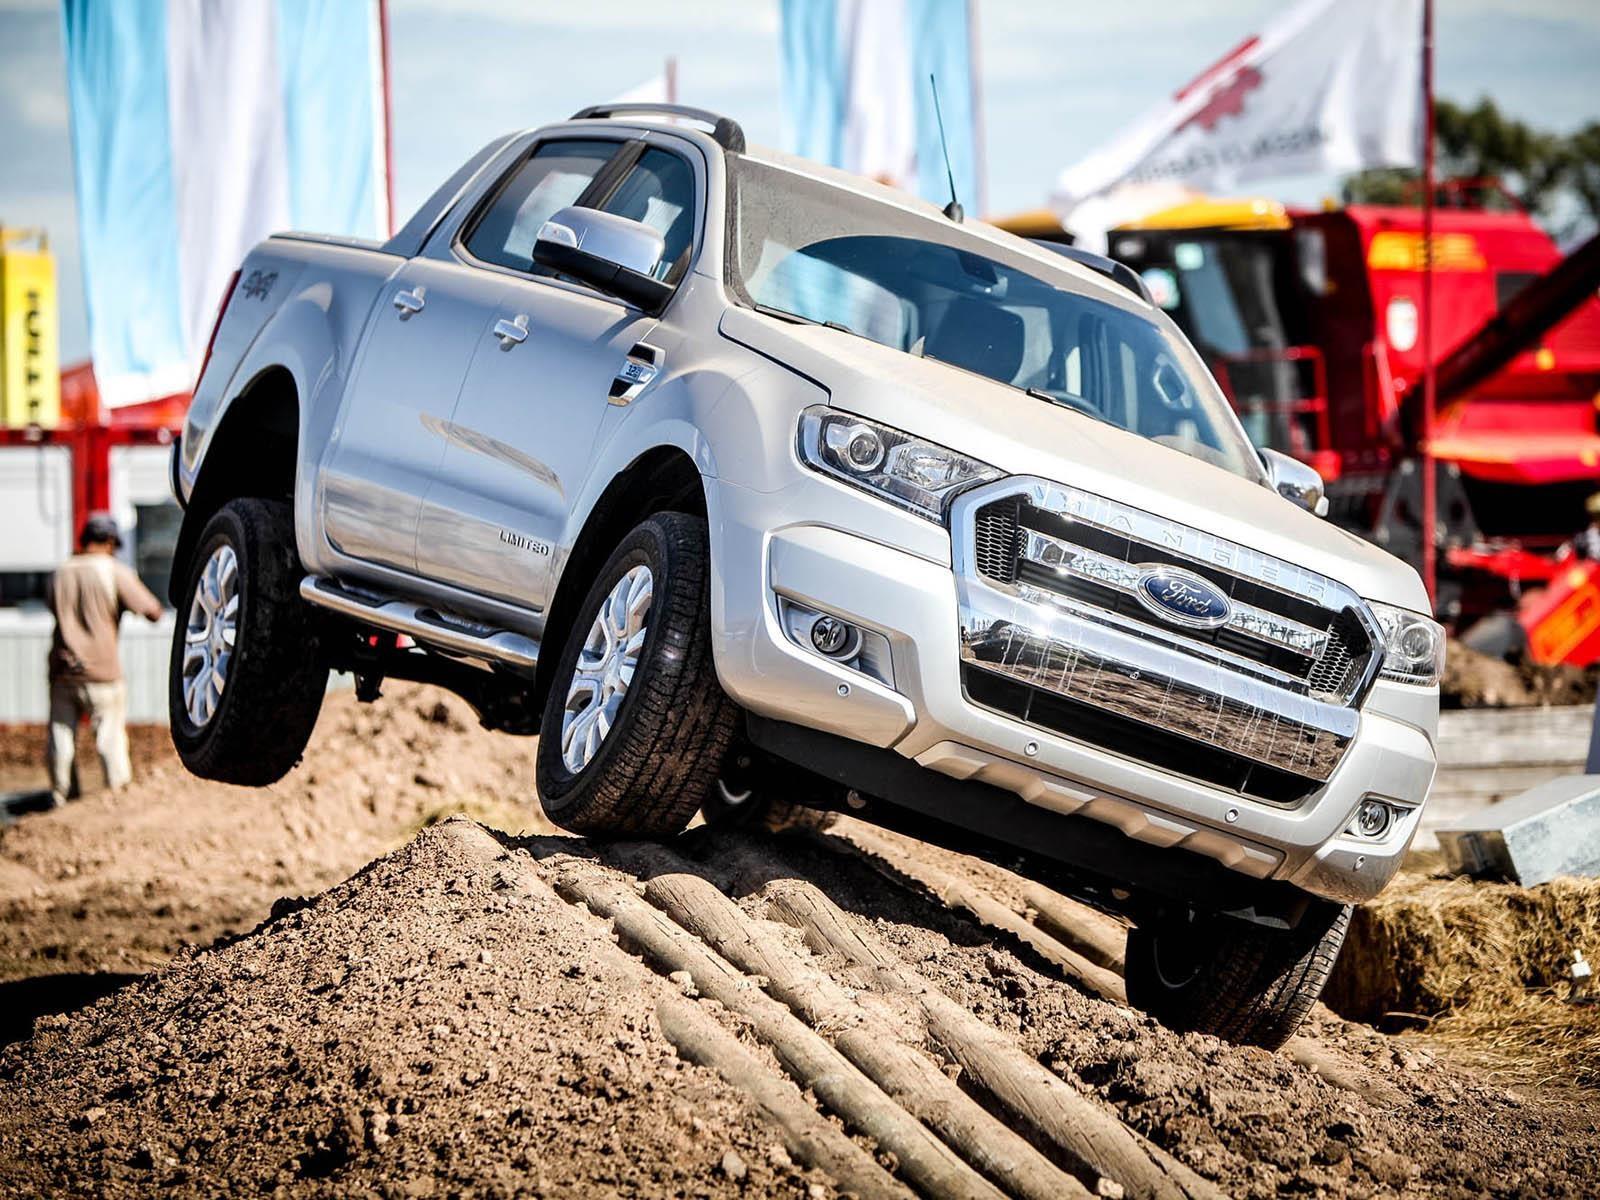 La Ford Ranger es el sponsor oficial de La Rural